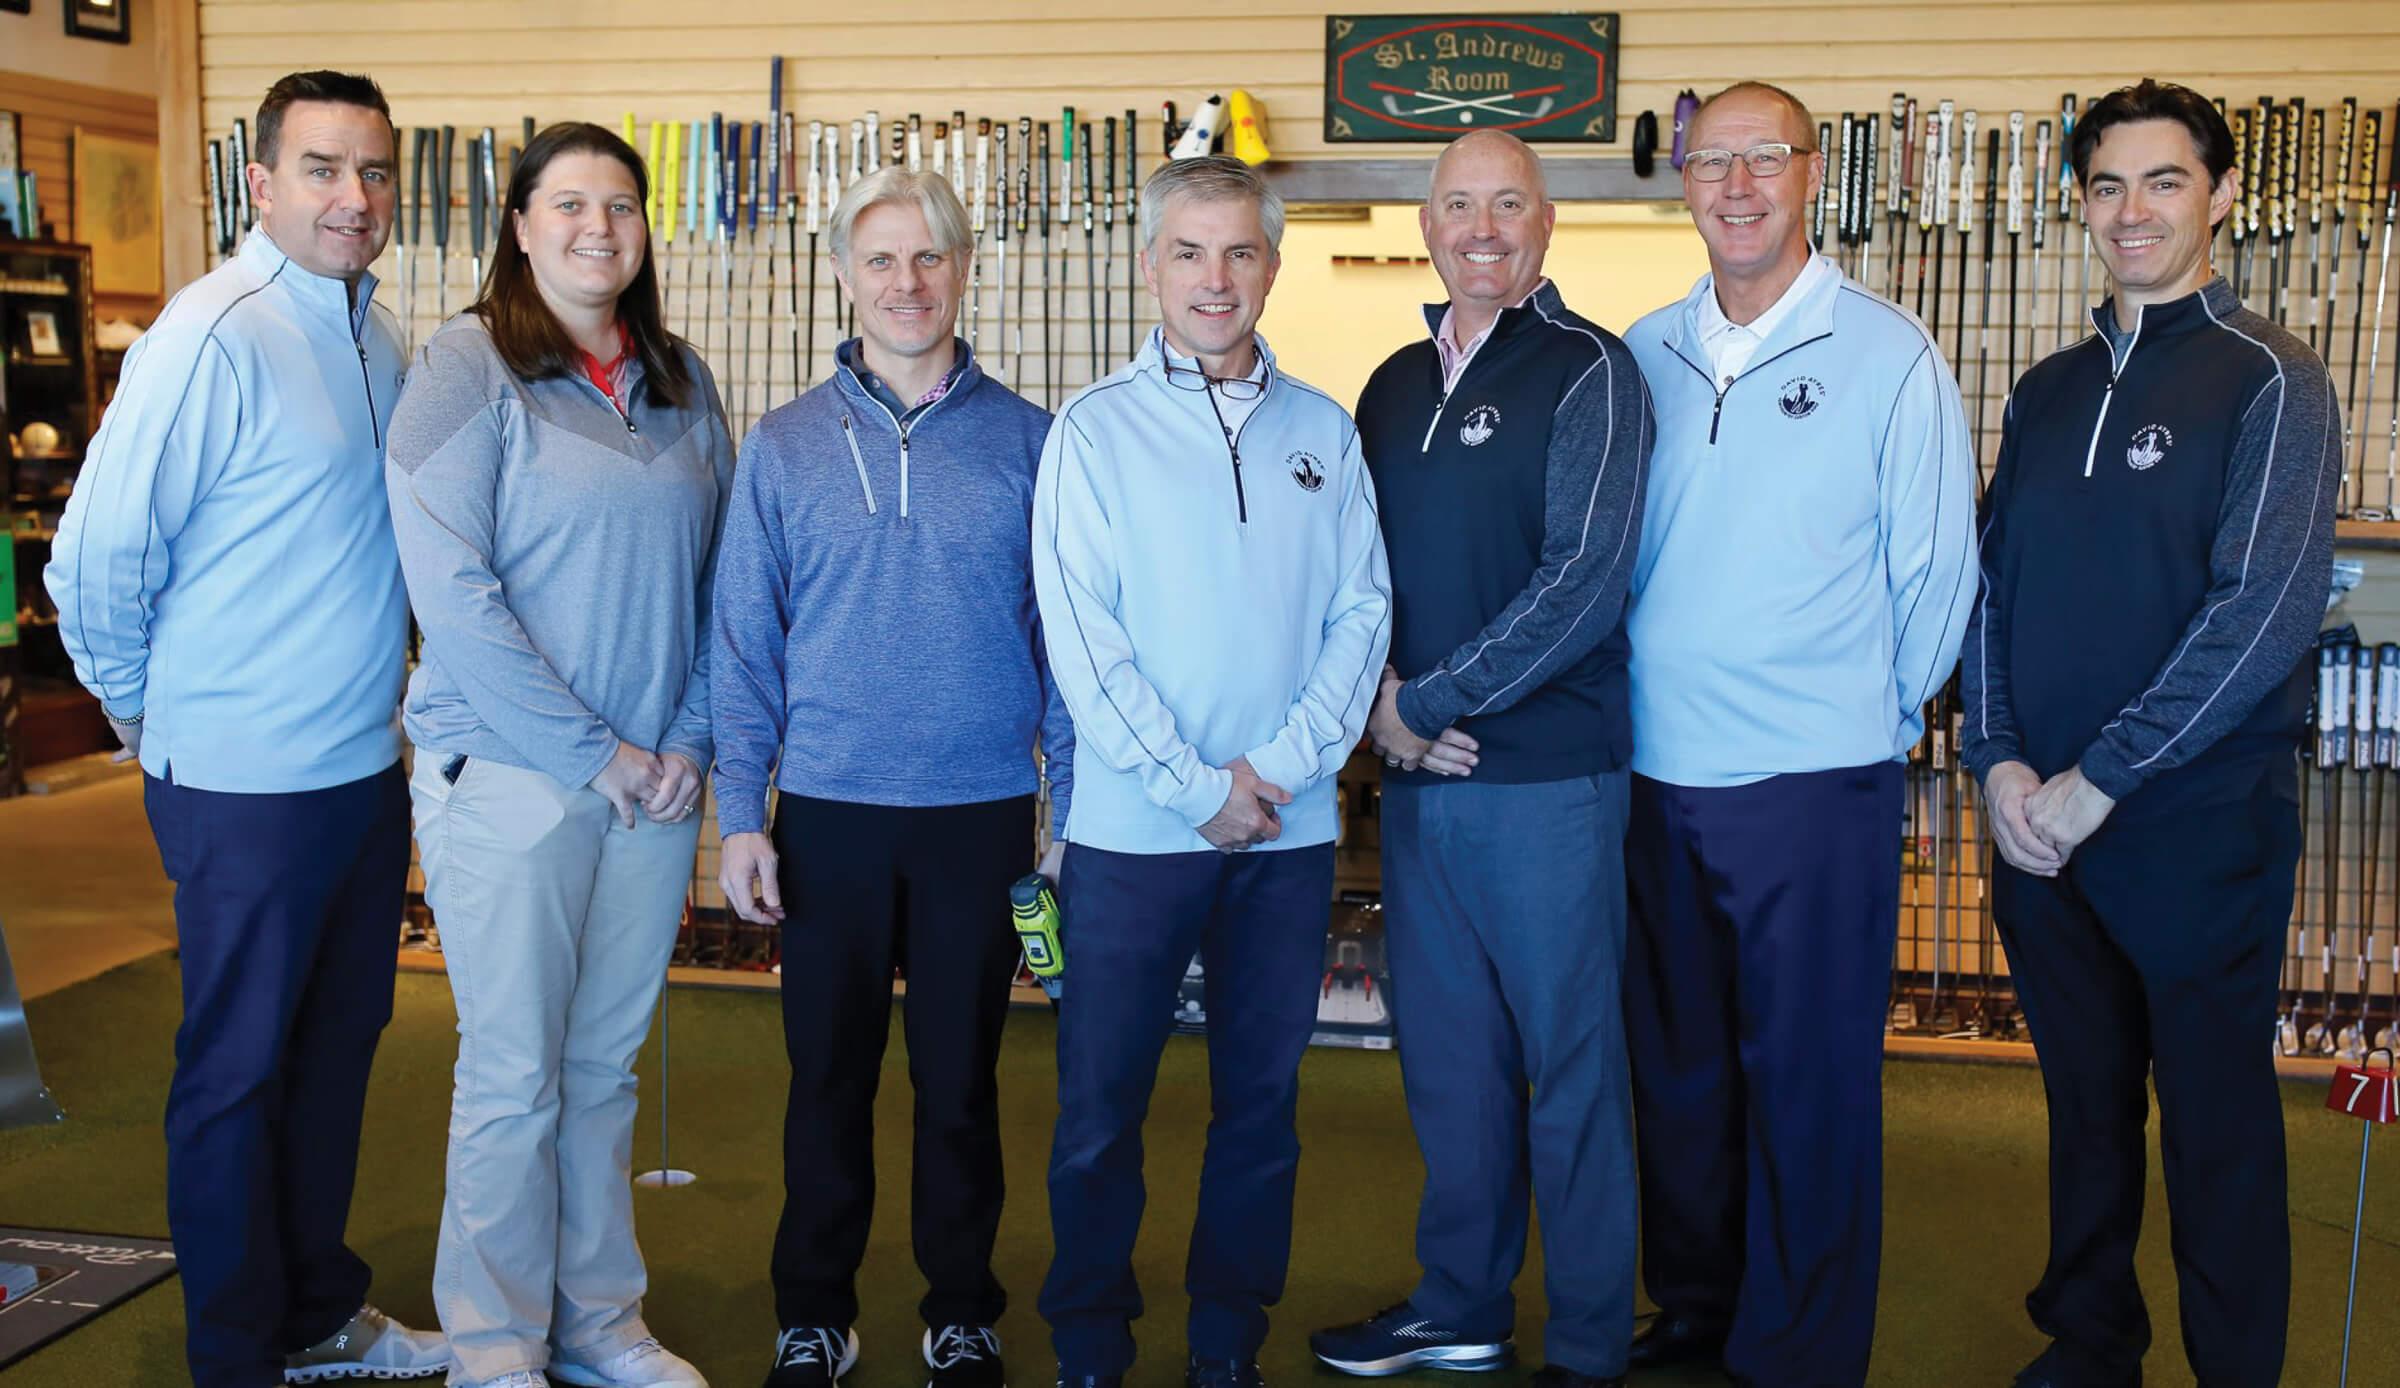 David Ayres' Lowcountry Custom Golf